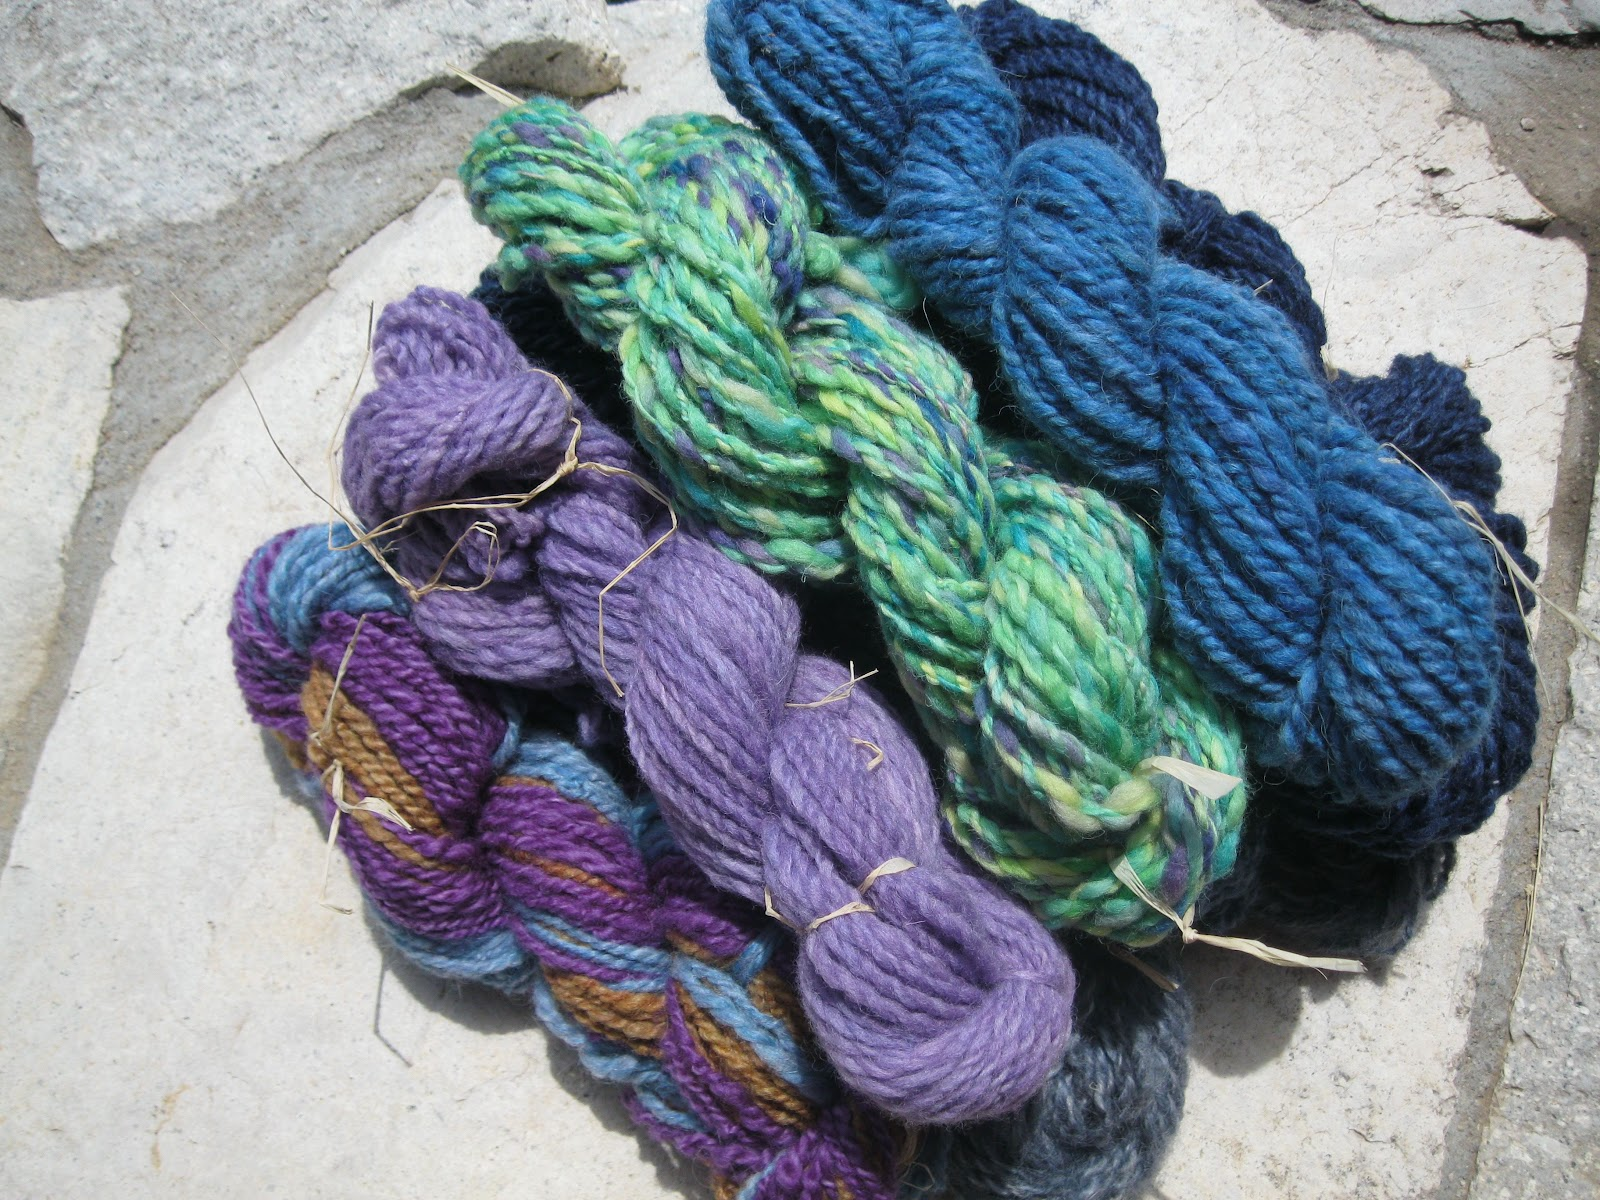 Rug Hooking With Yarn Rugs Ideas